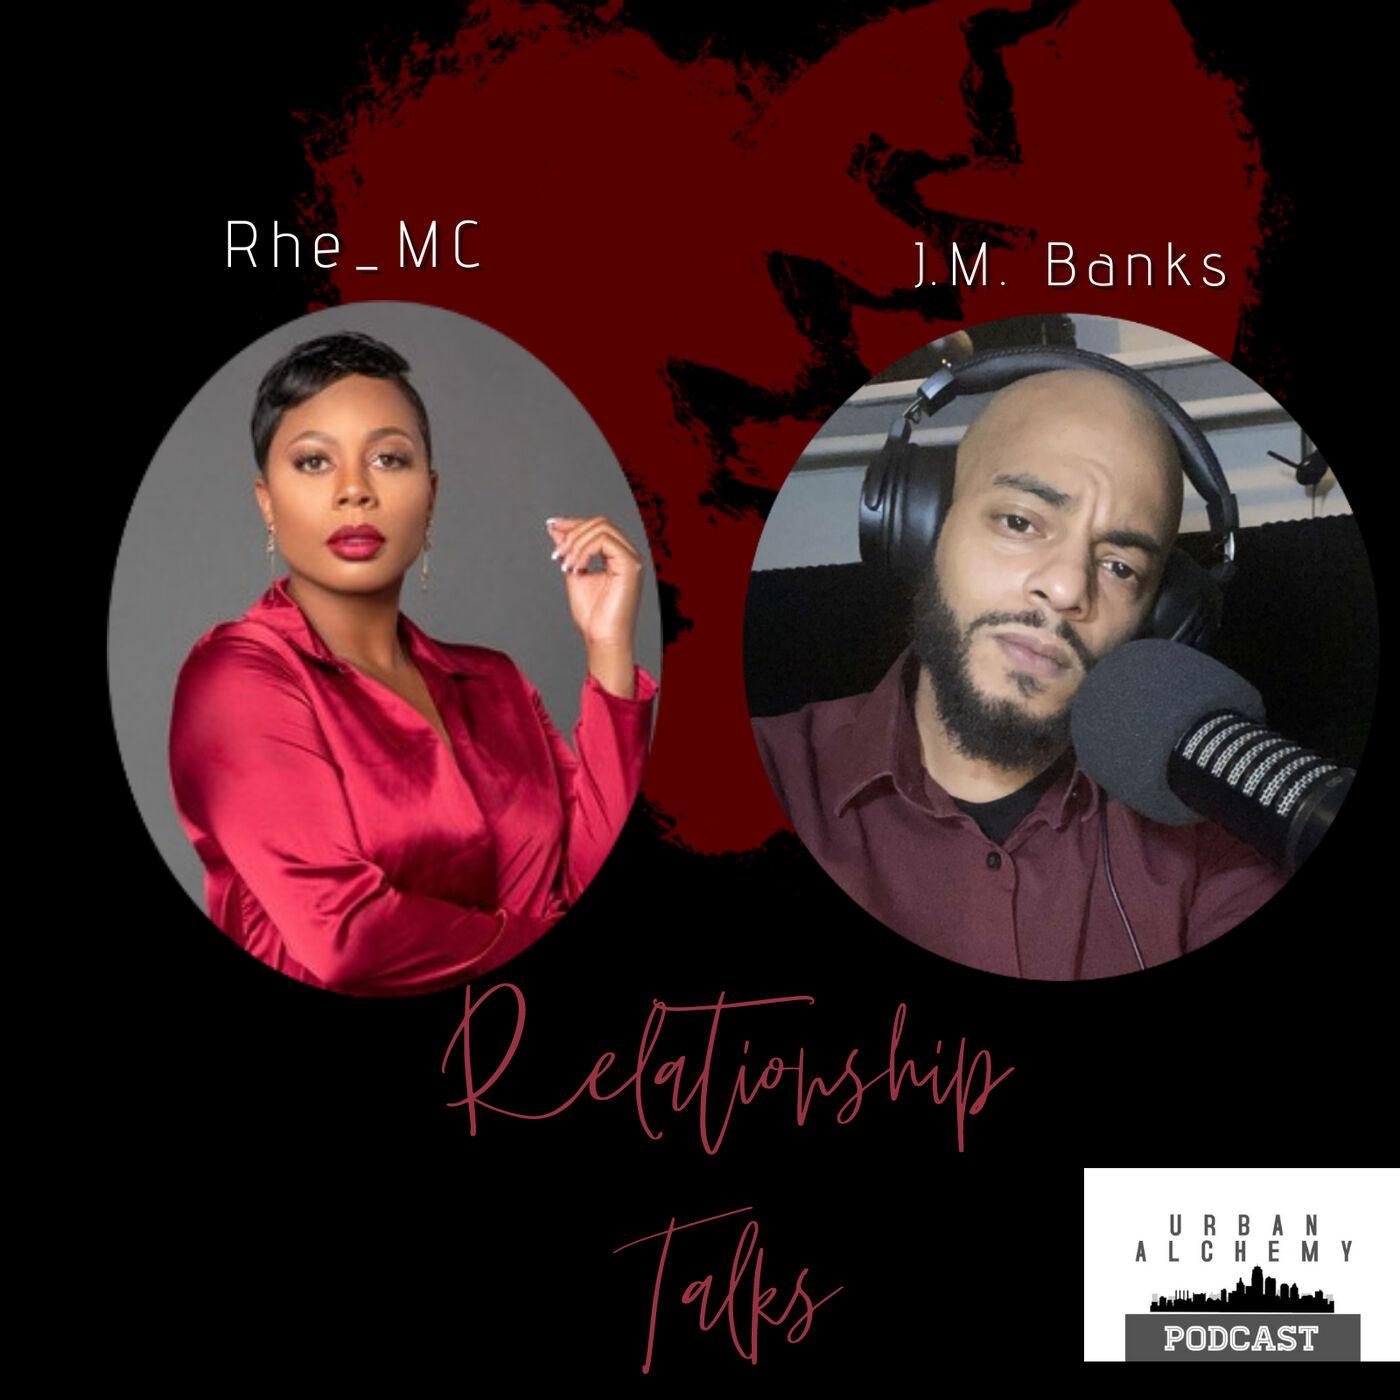 Relationship Talks - The Sloppy 2nd